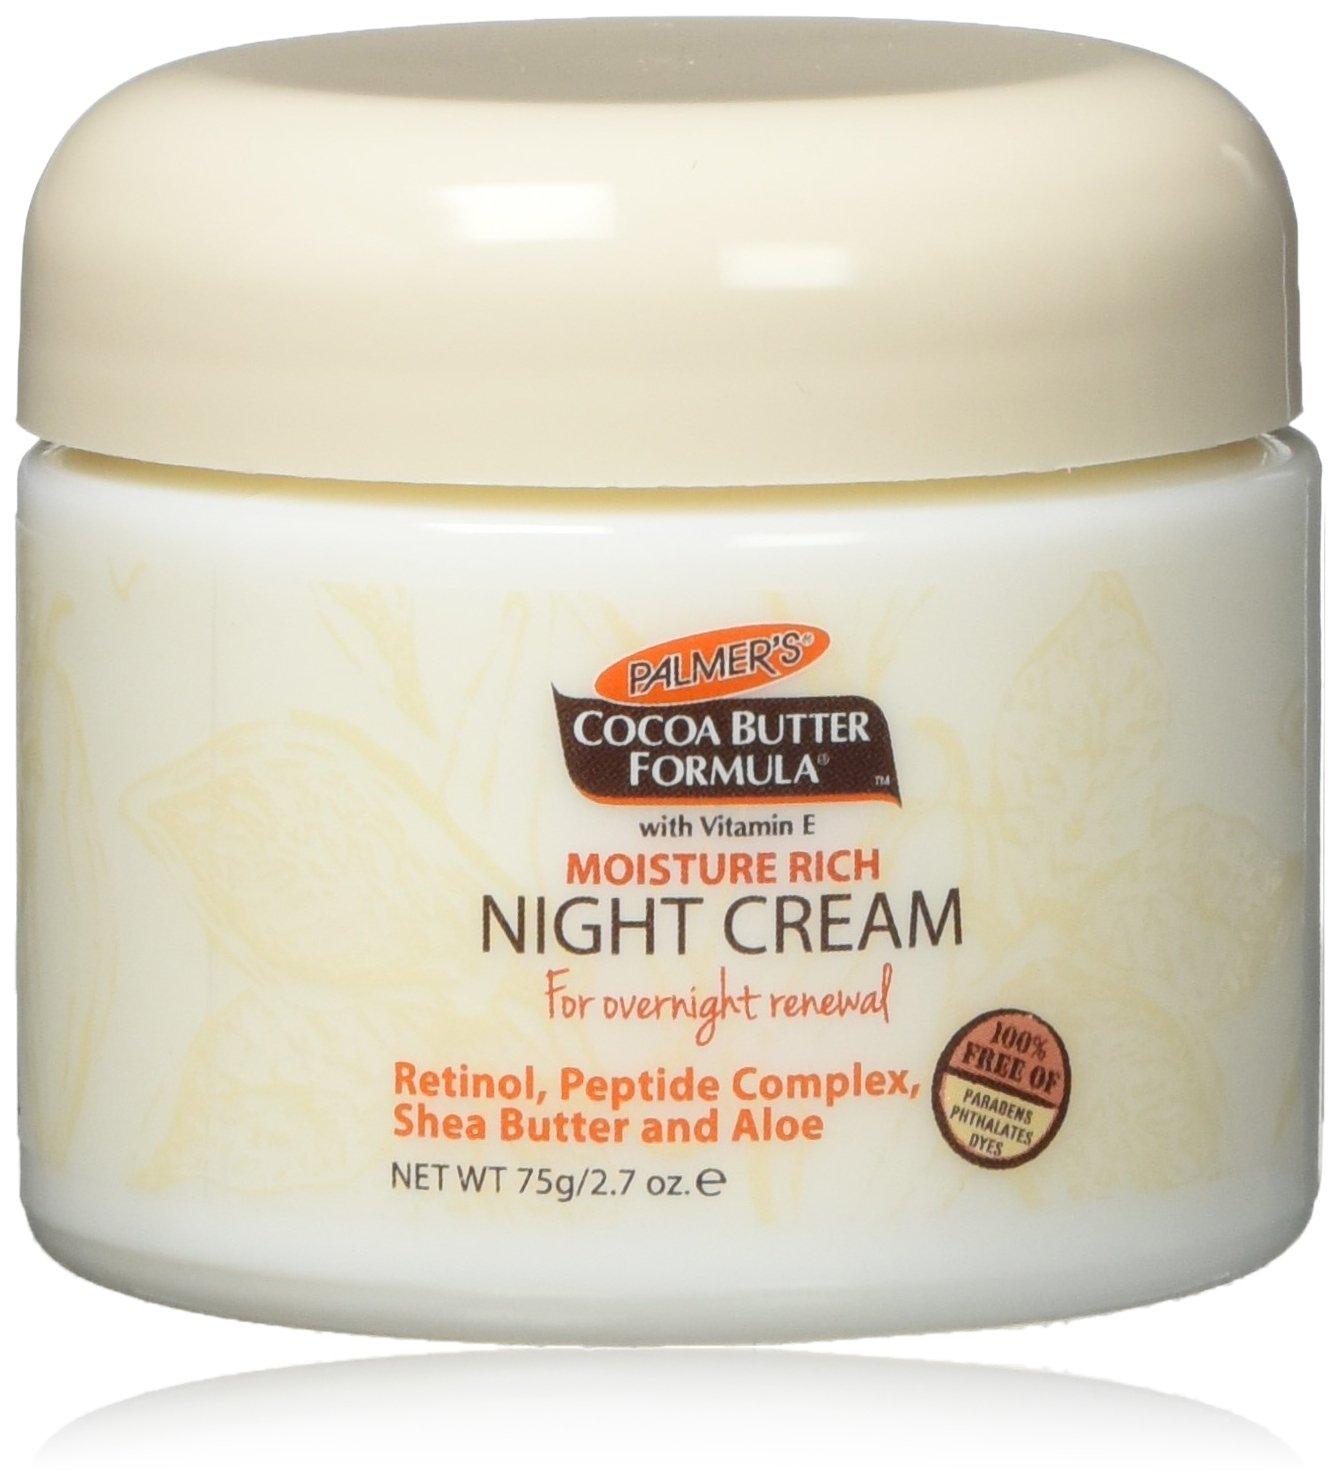 Palmer's Cocoa Butter Formula Moisture Rich Night Cream, 2.70 Oz by Palmer's